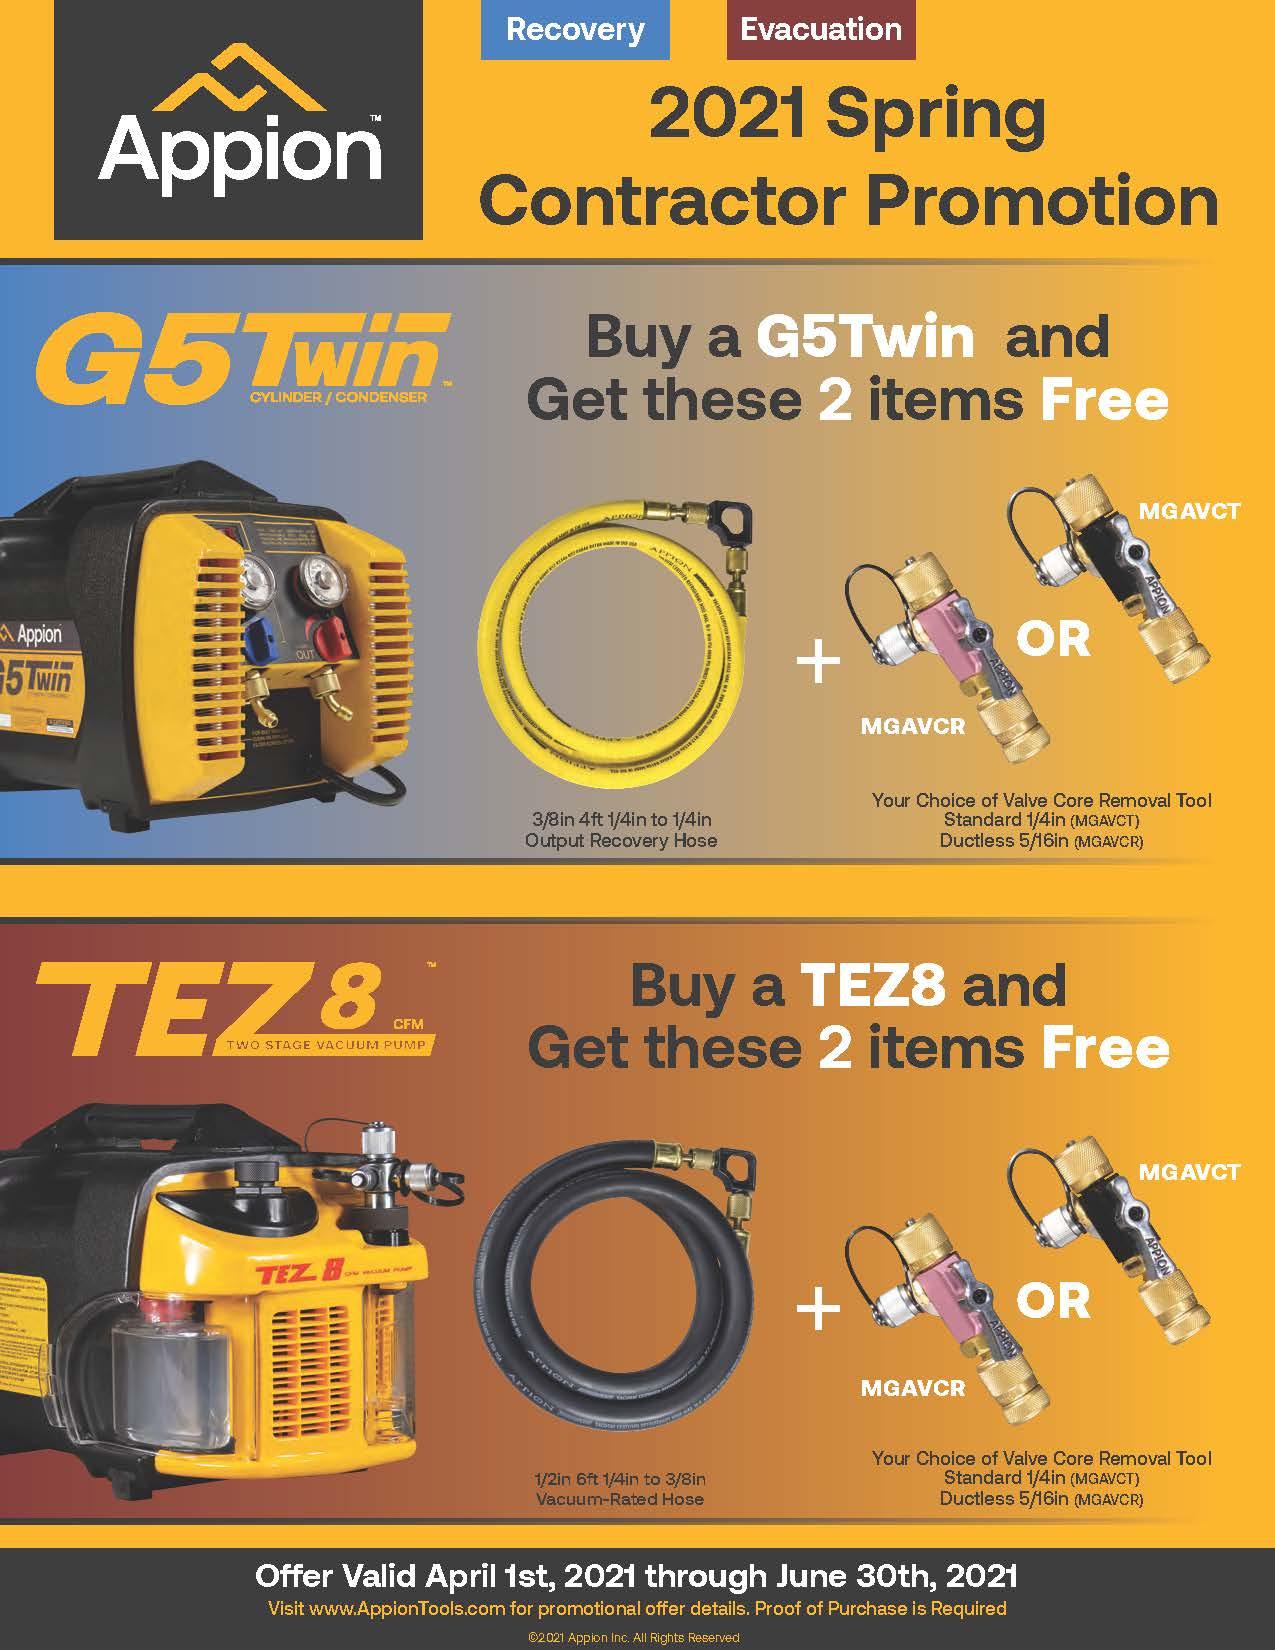 2021-spring-contractor-promo-page-1.jpg